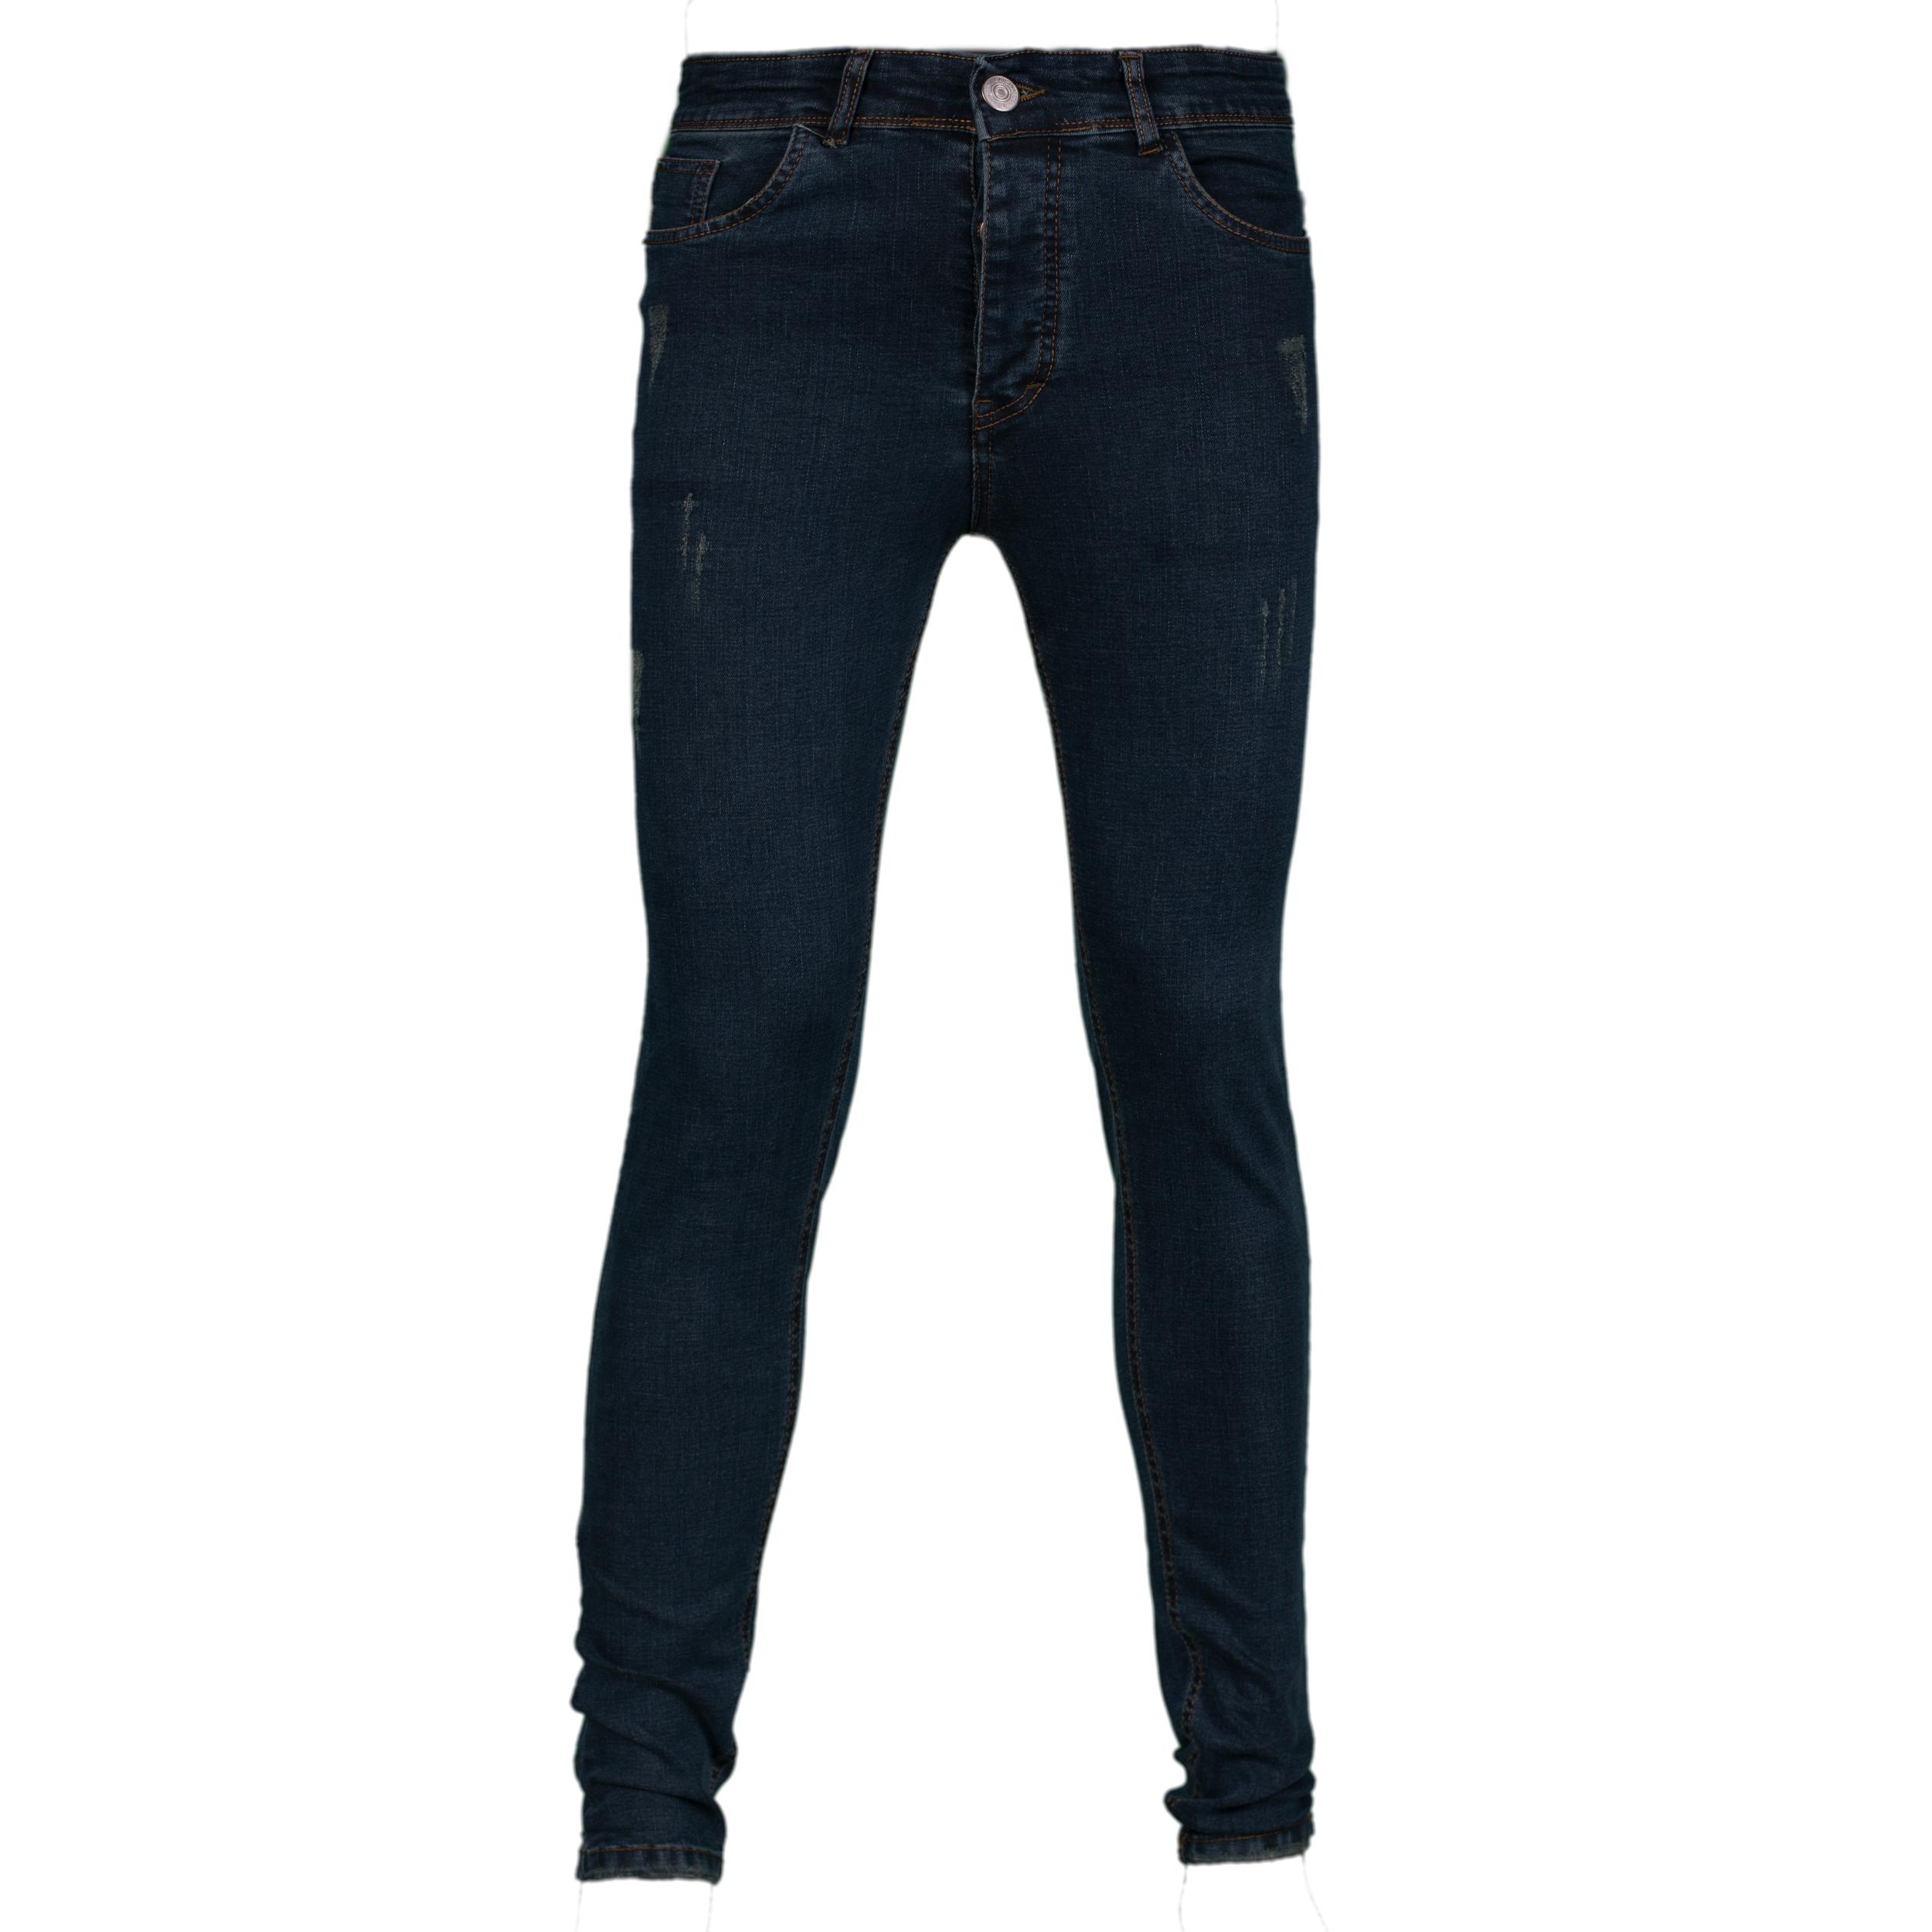 شلوار جین مردانه  کد s17